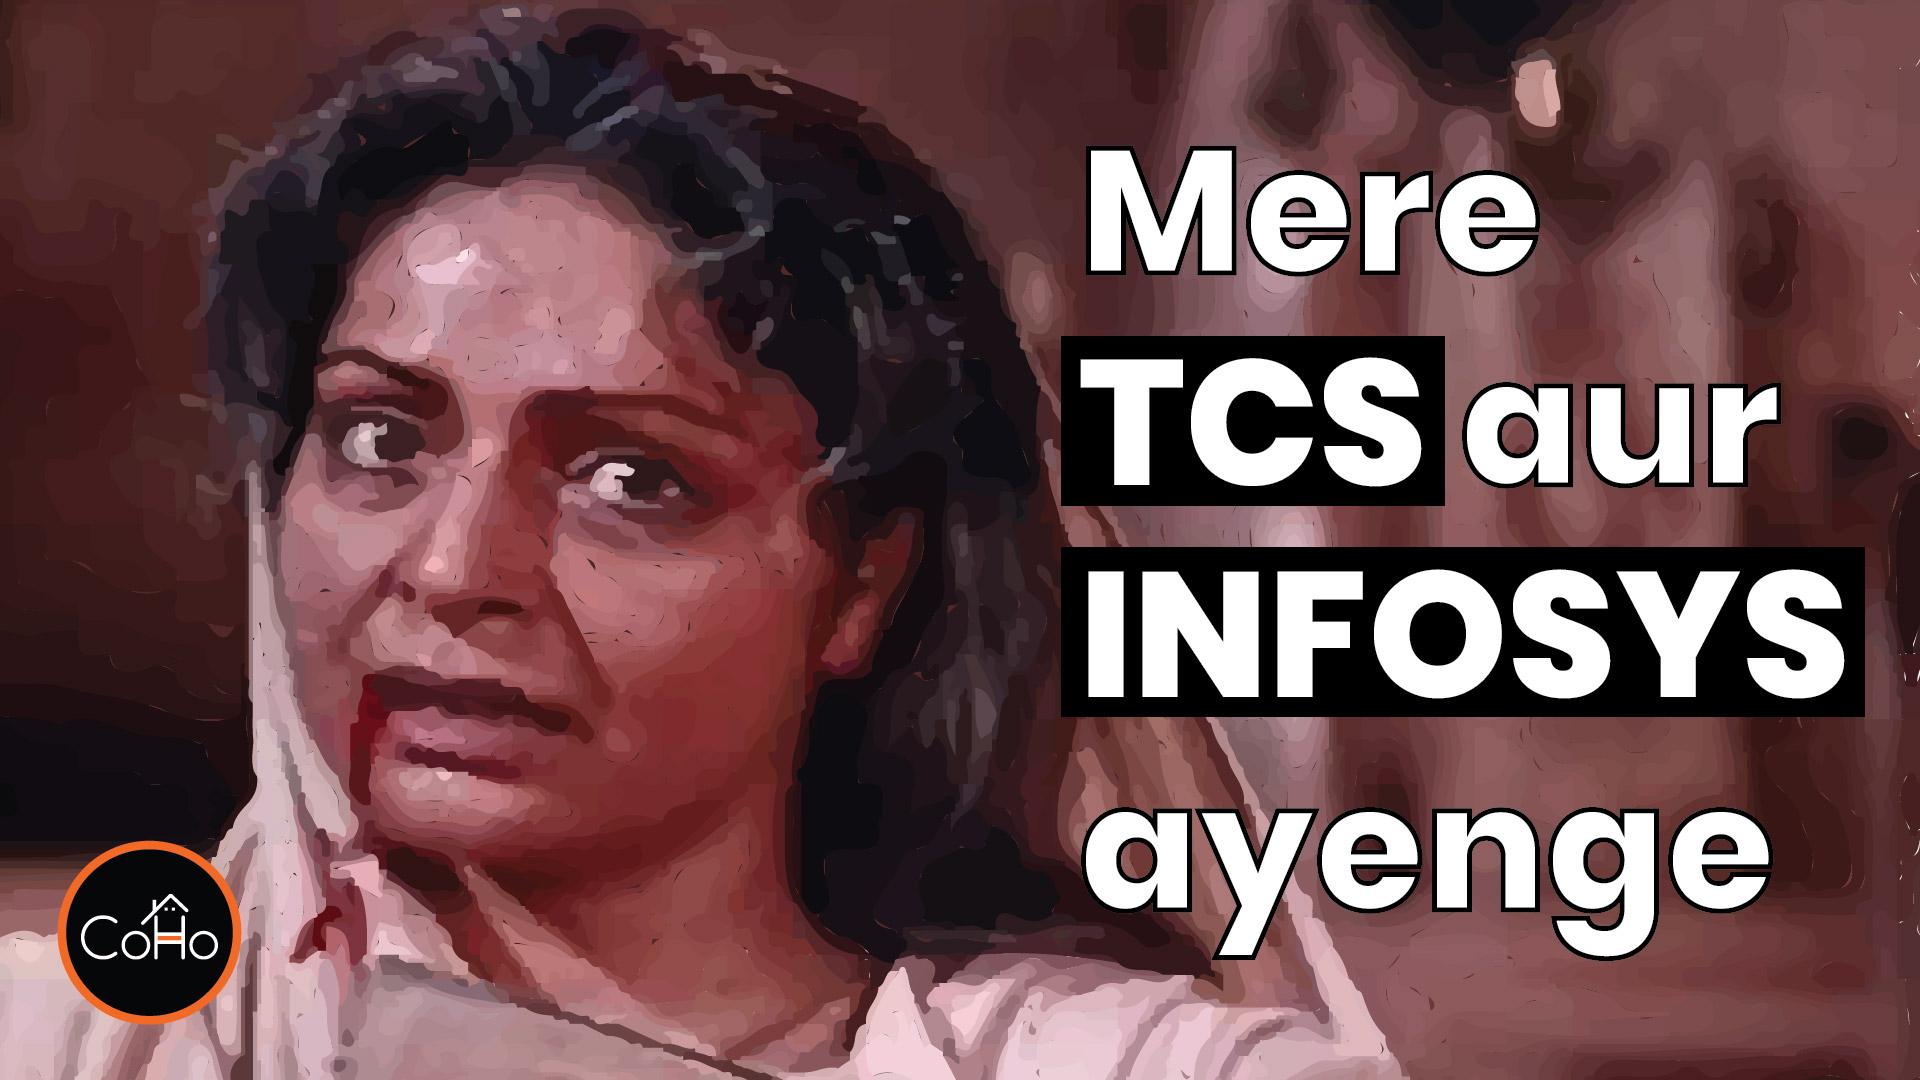 """Mere TCS/Infosys zarur aayenge""..."